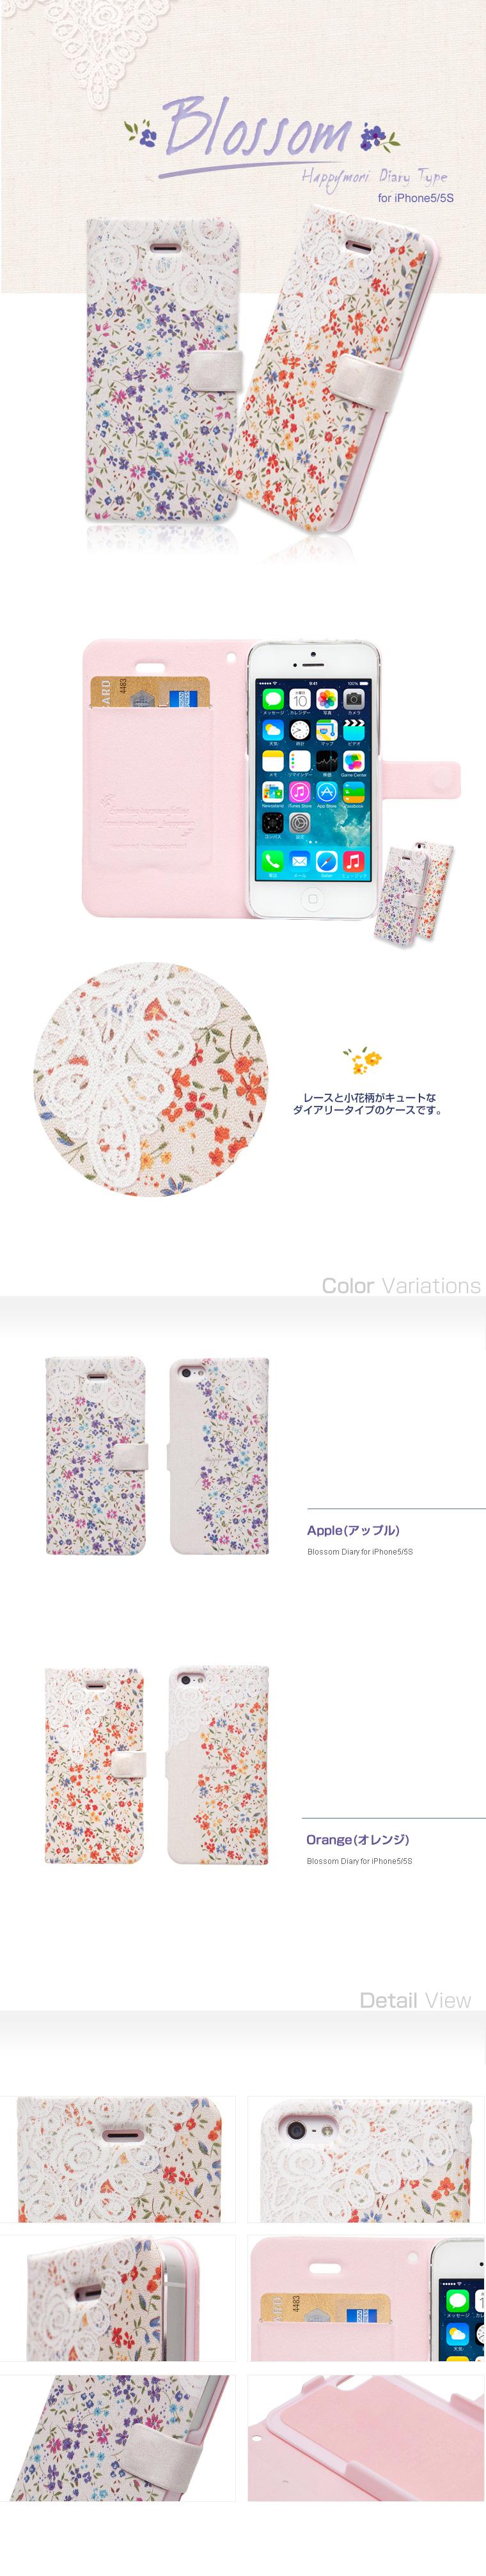 【iPhone5S/5】Happymori Blossom Diary (ハッピーモリ− ブロッサム ダイアリー)